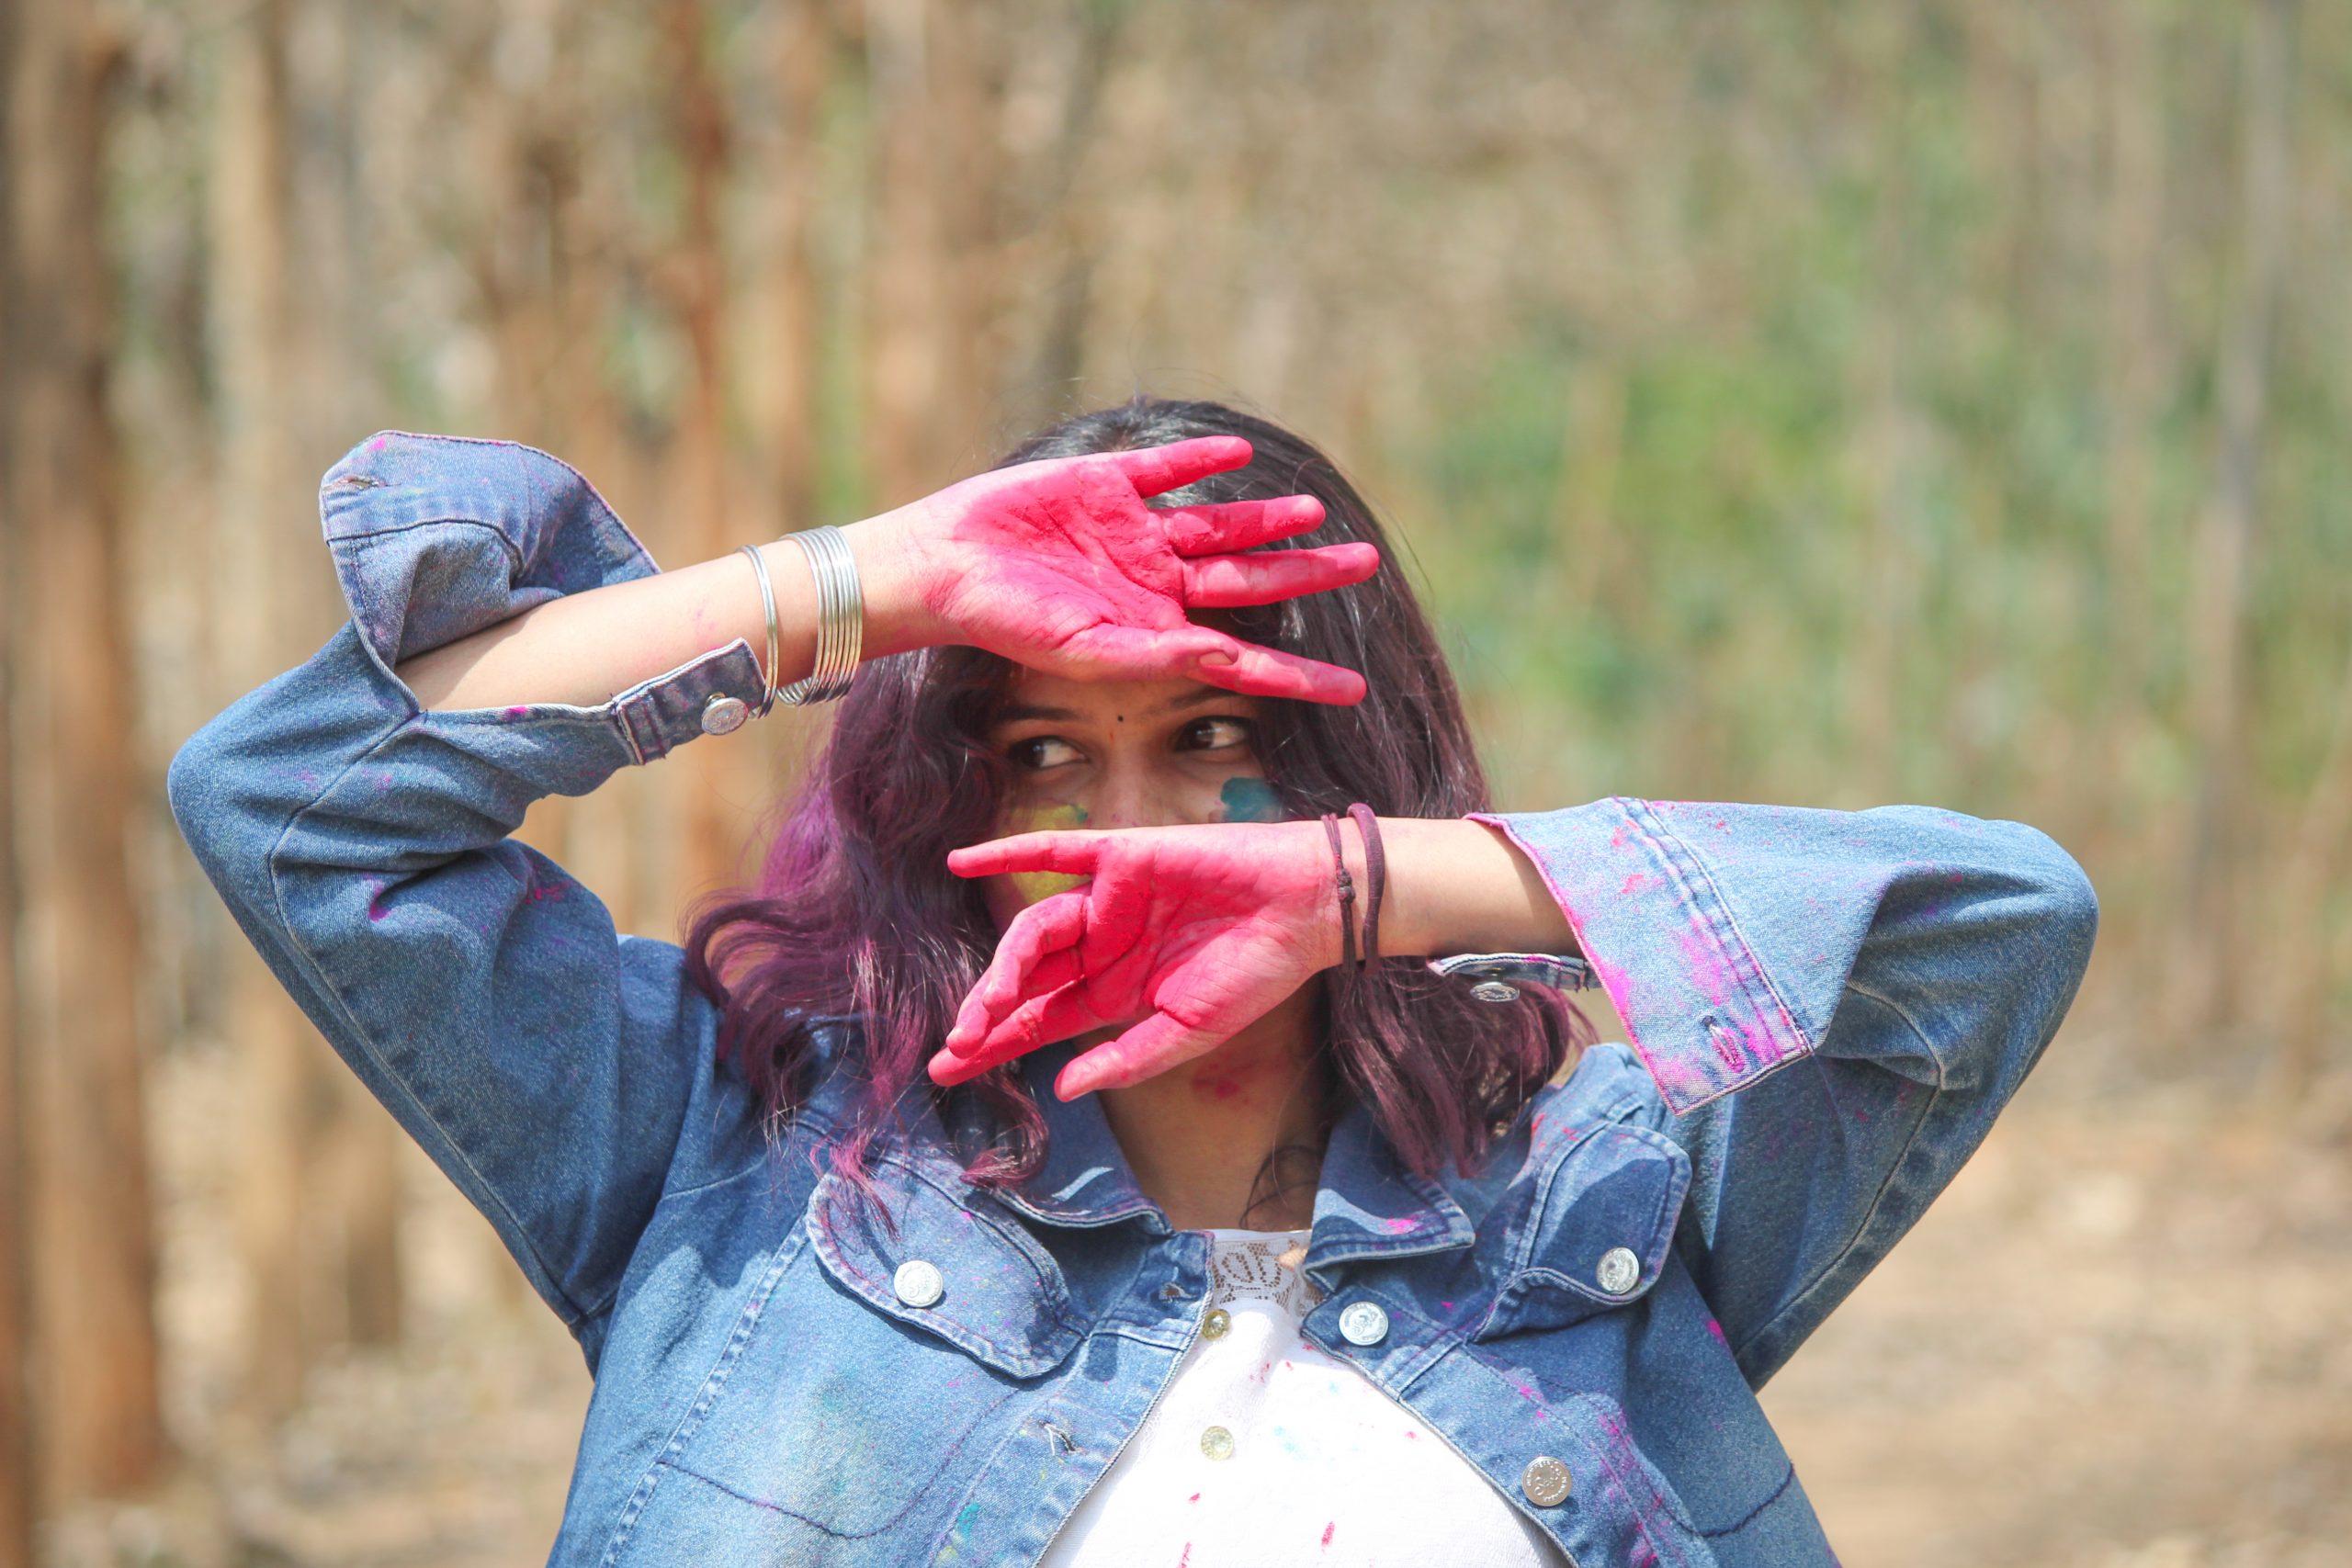 A girl celebrating Holi festival